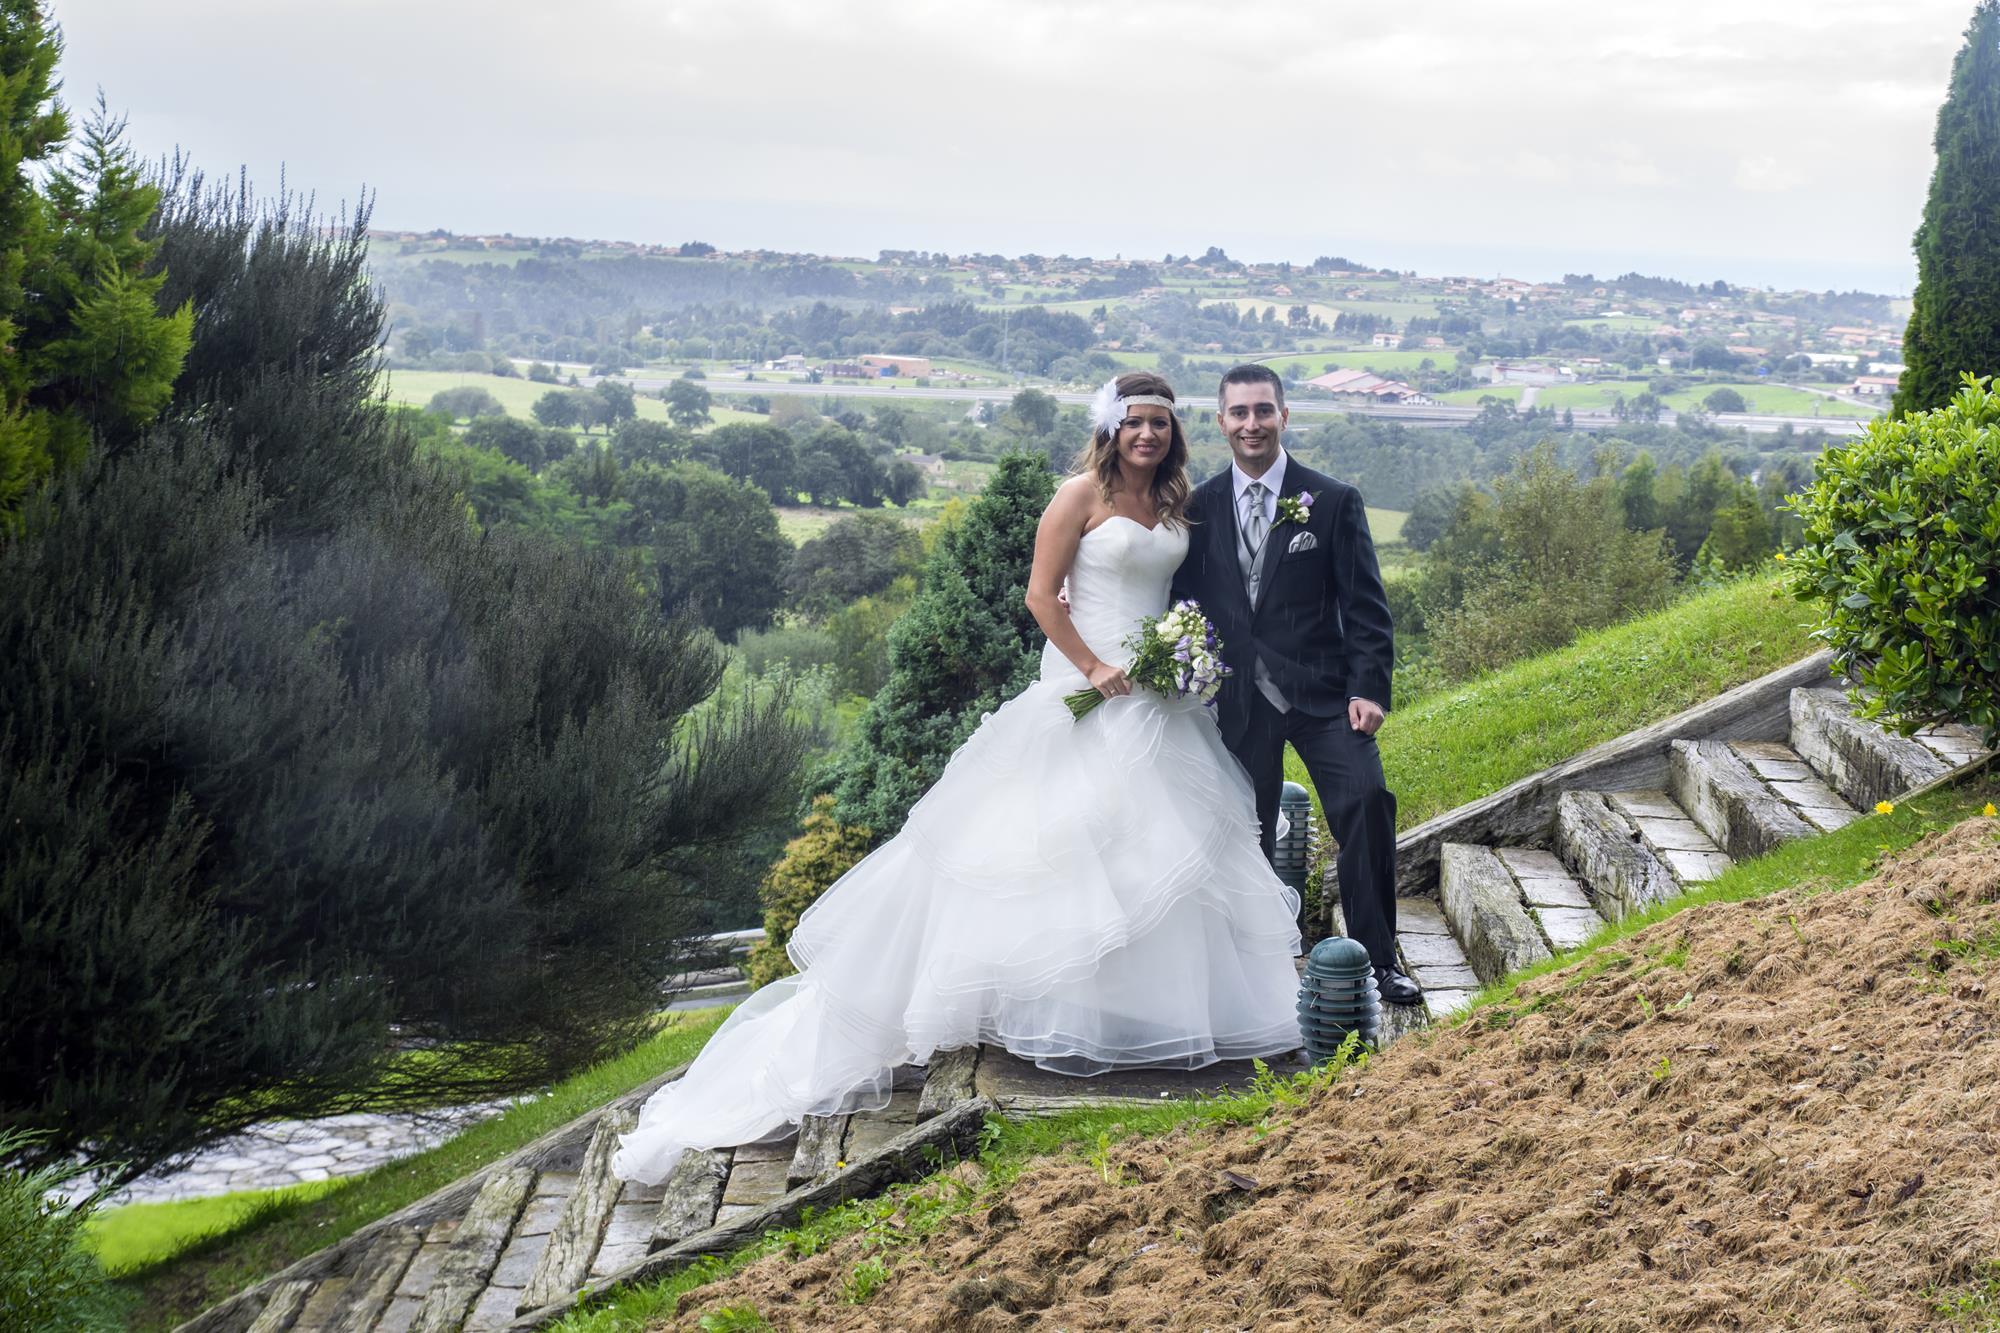 Entre los 10 mejores fot grafos de bodas en gij n asturias sonia menendez interfilm gijon - Fotografos gijon ...